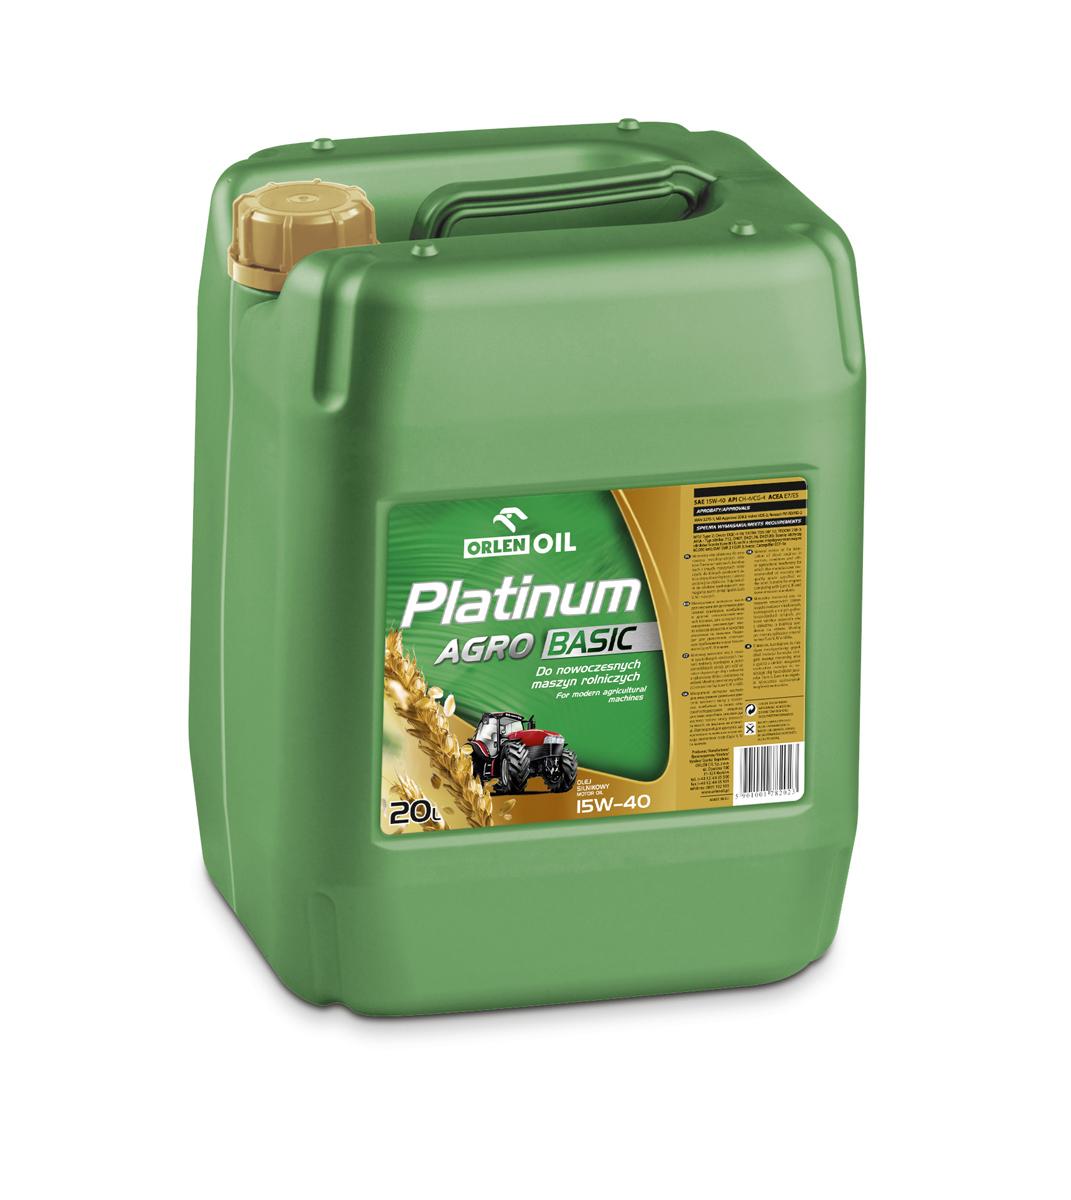 PLATINUM AGRO BASIC 15W/40   KP 20L